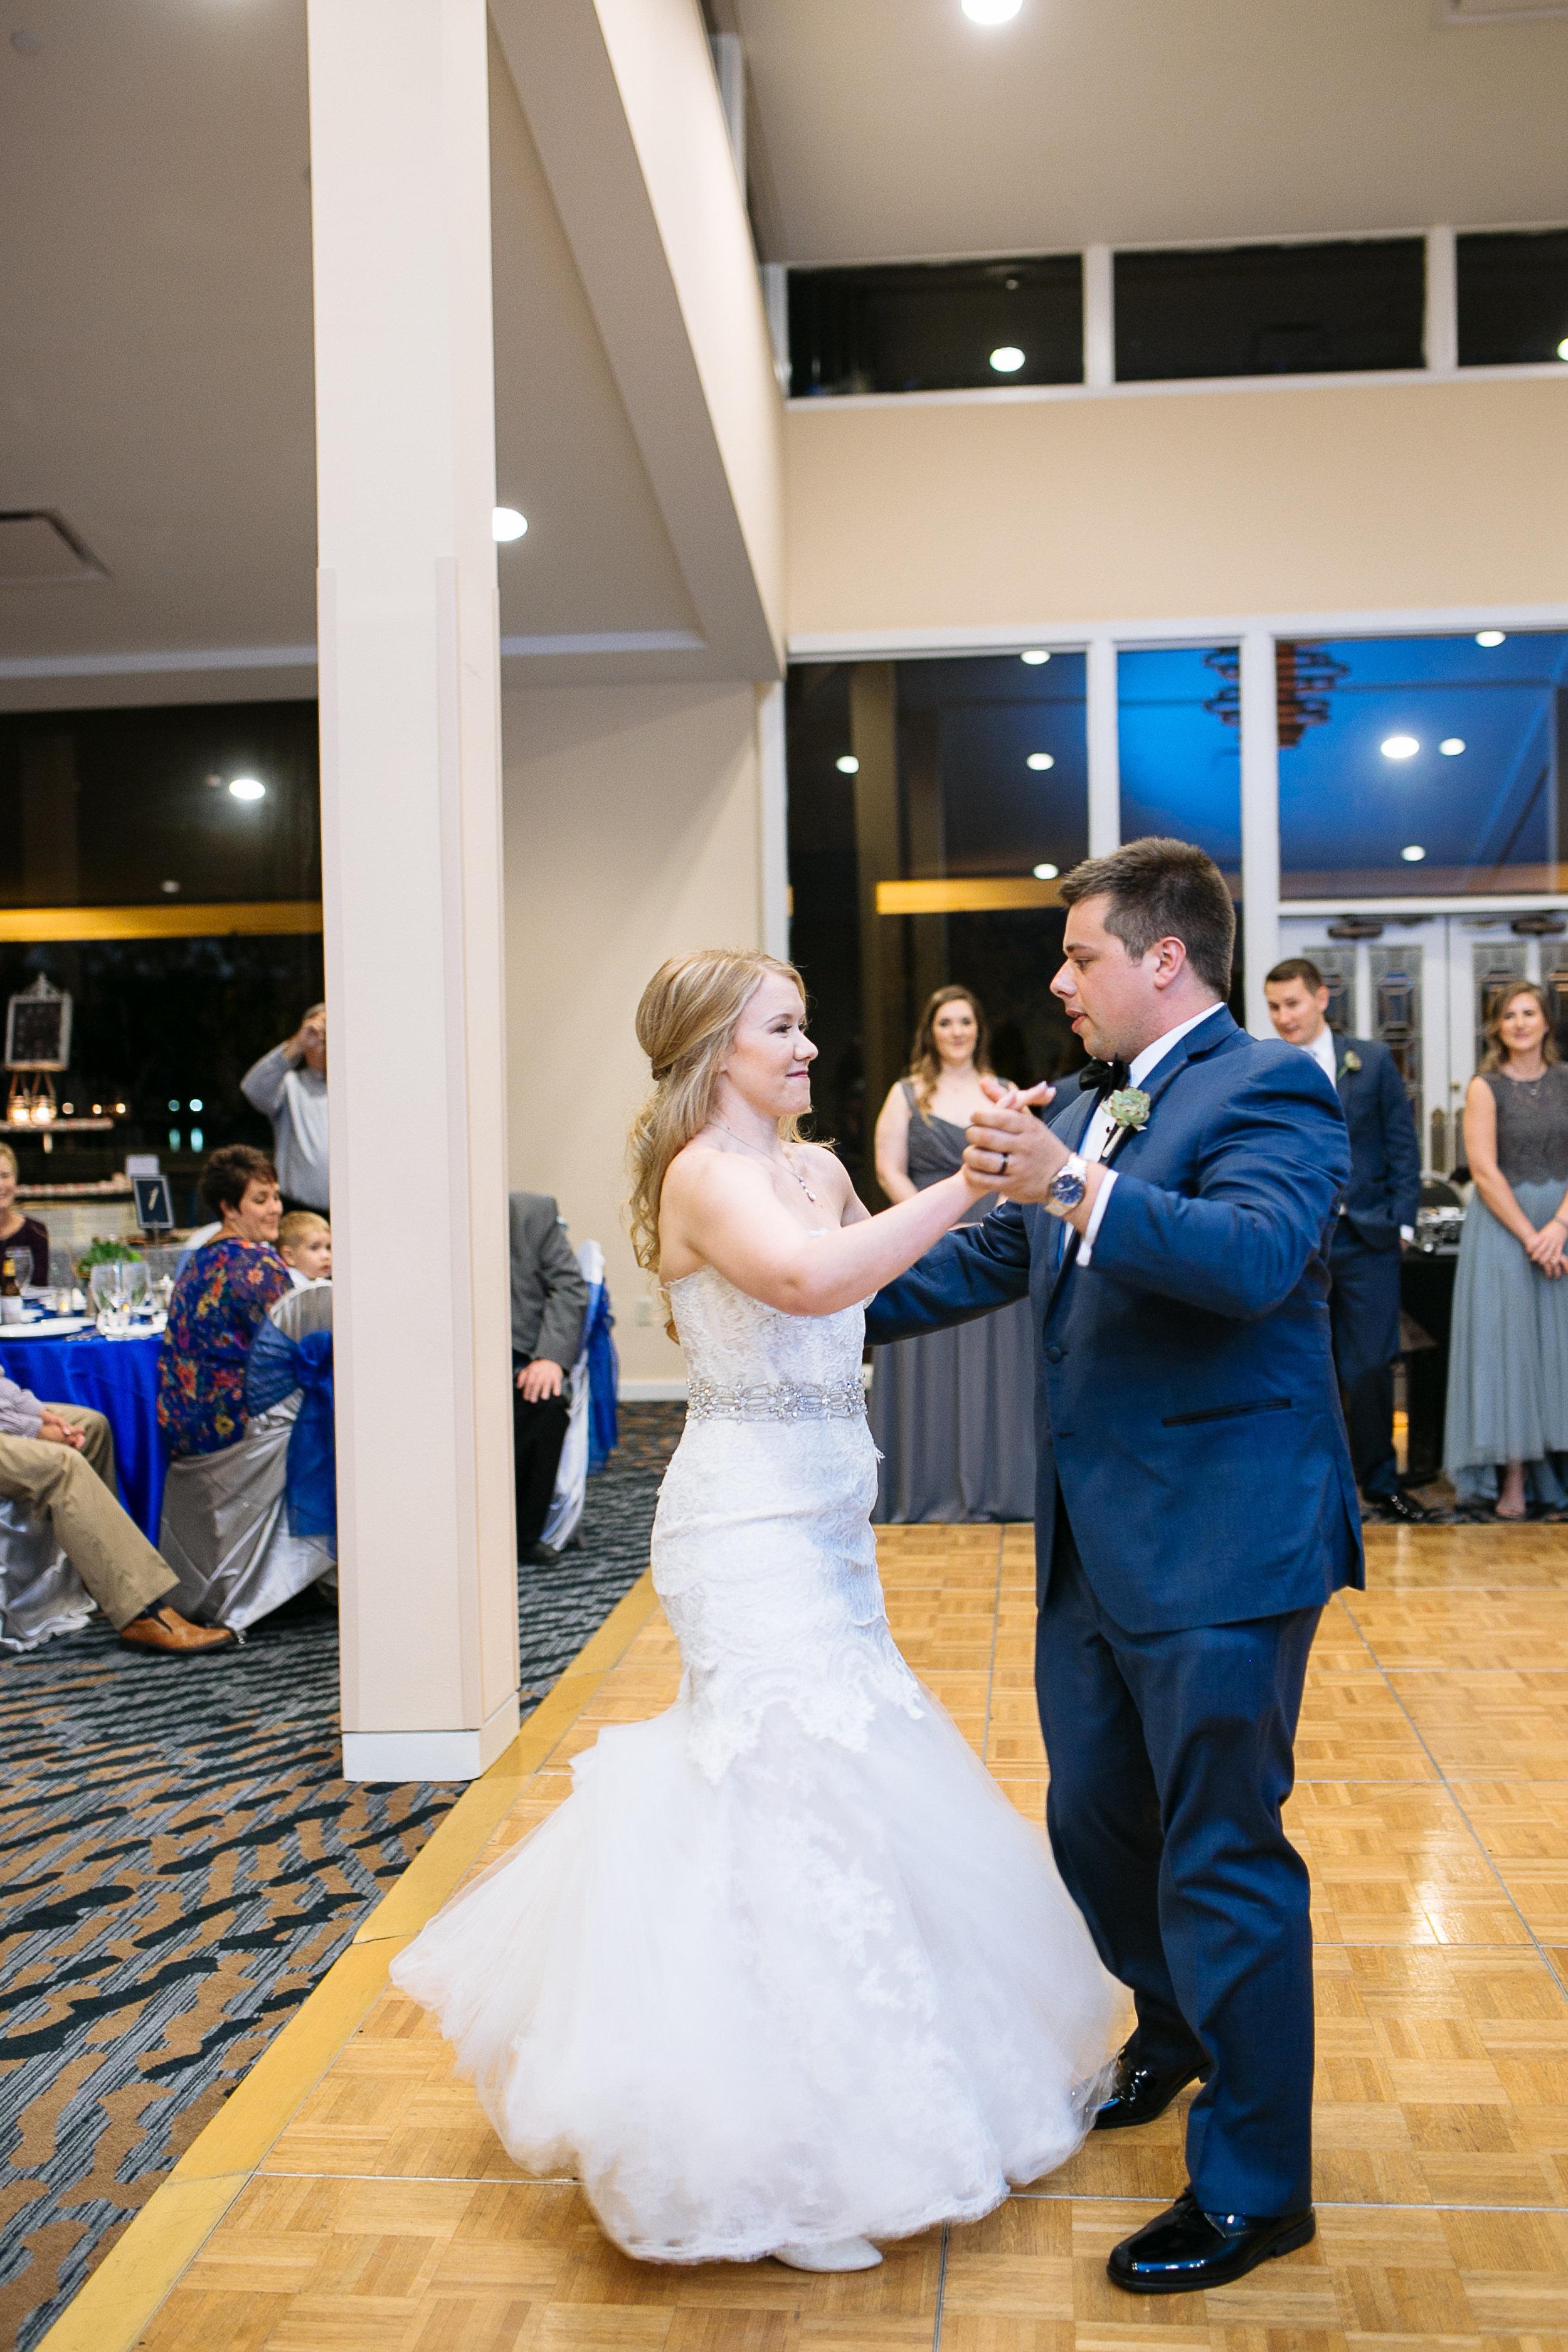 Sharing their first dance | Woodlands Resort Weddings